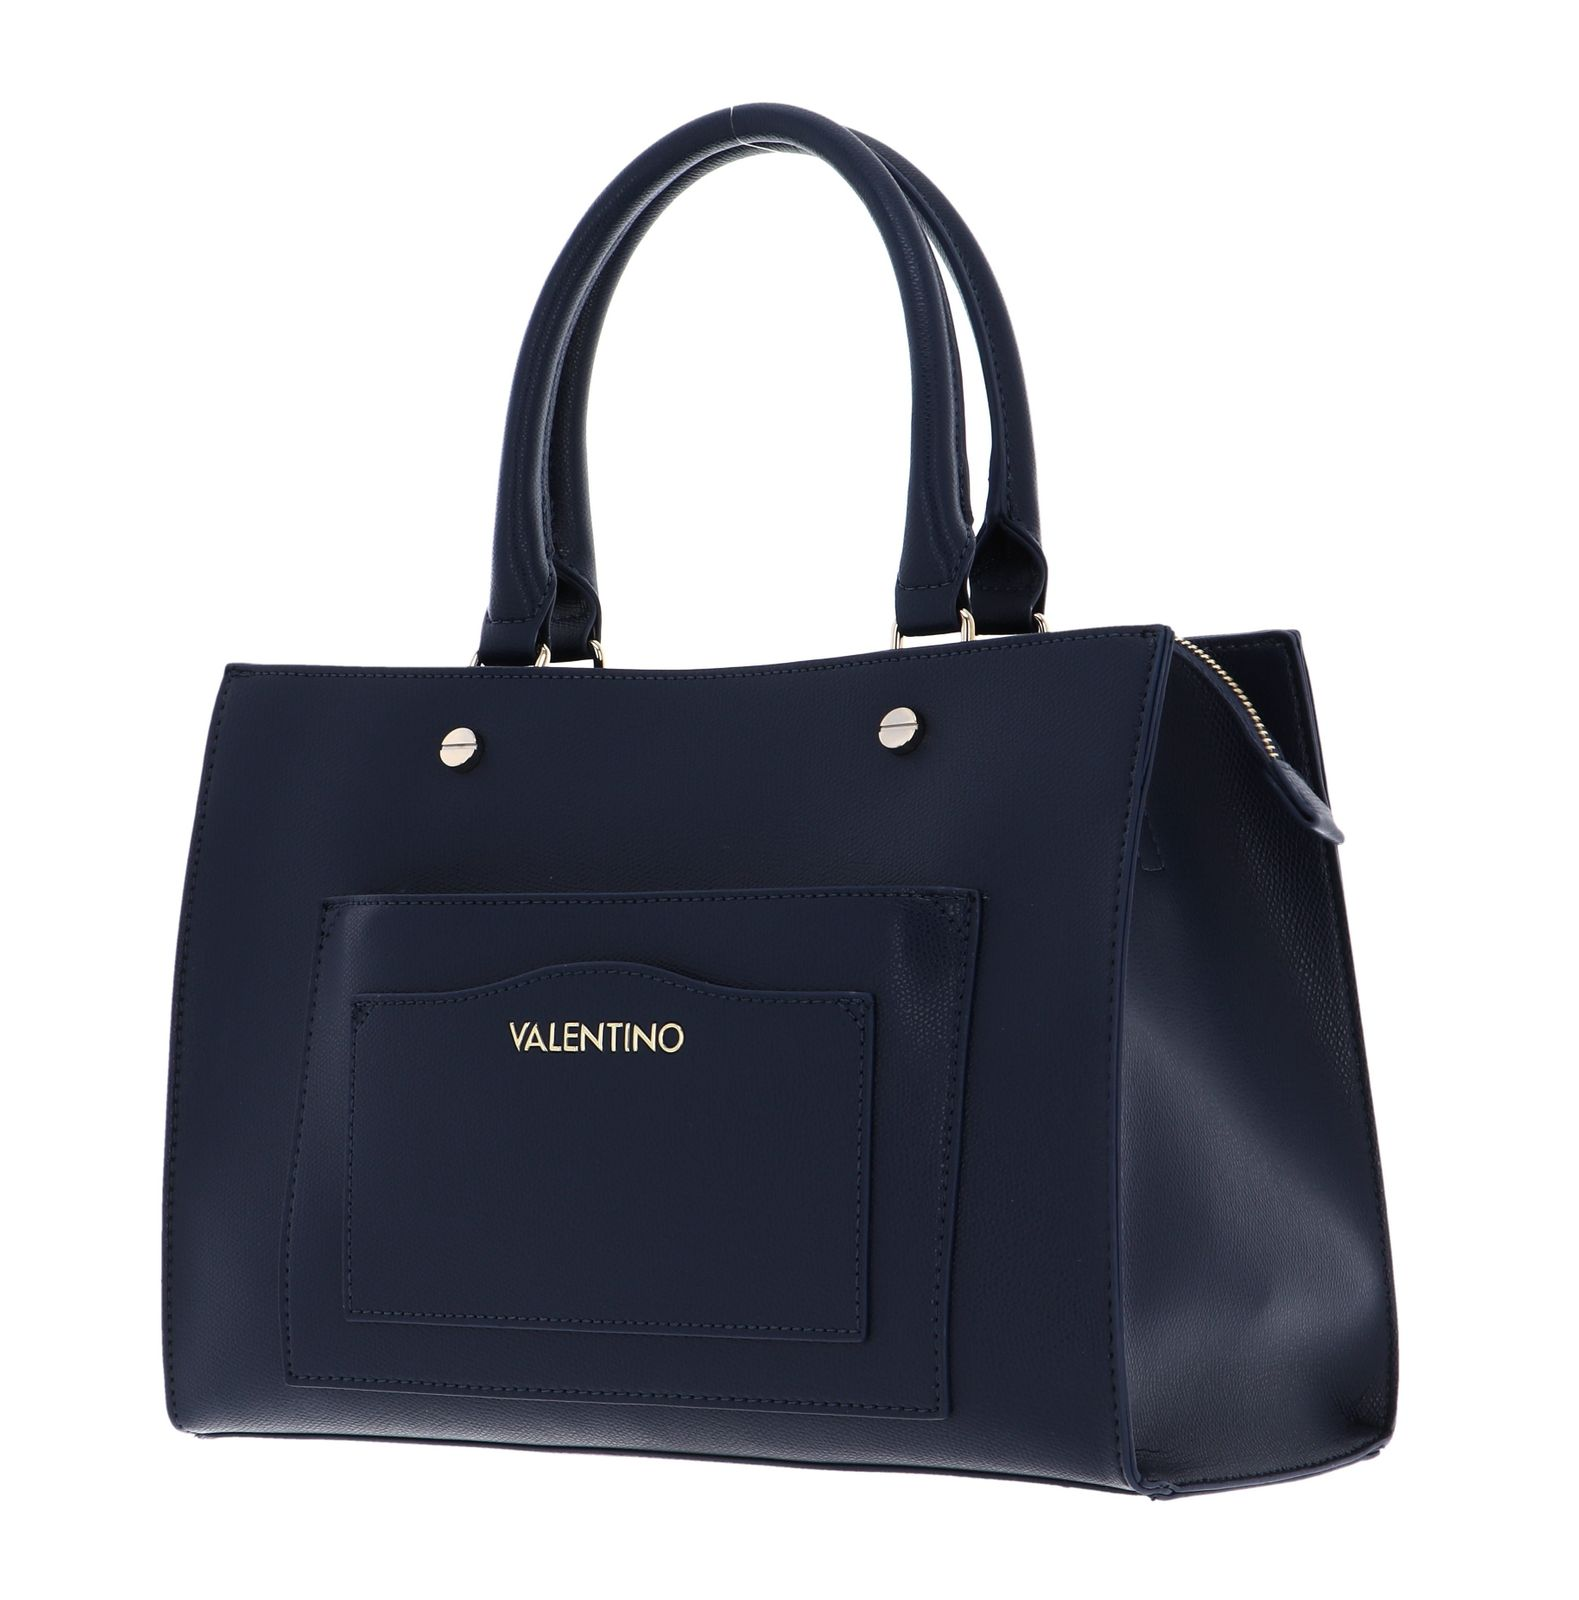 VALENTINO BAGS Maple Tote Bag Blu